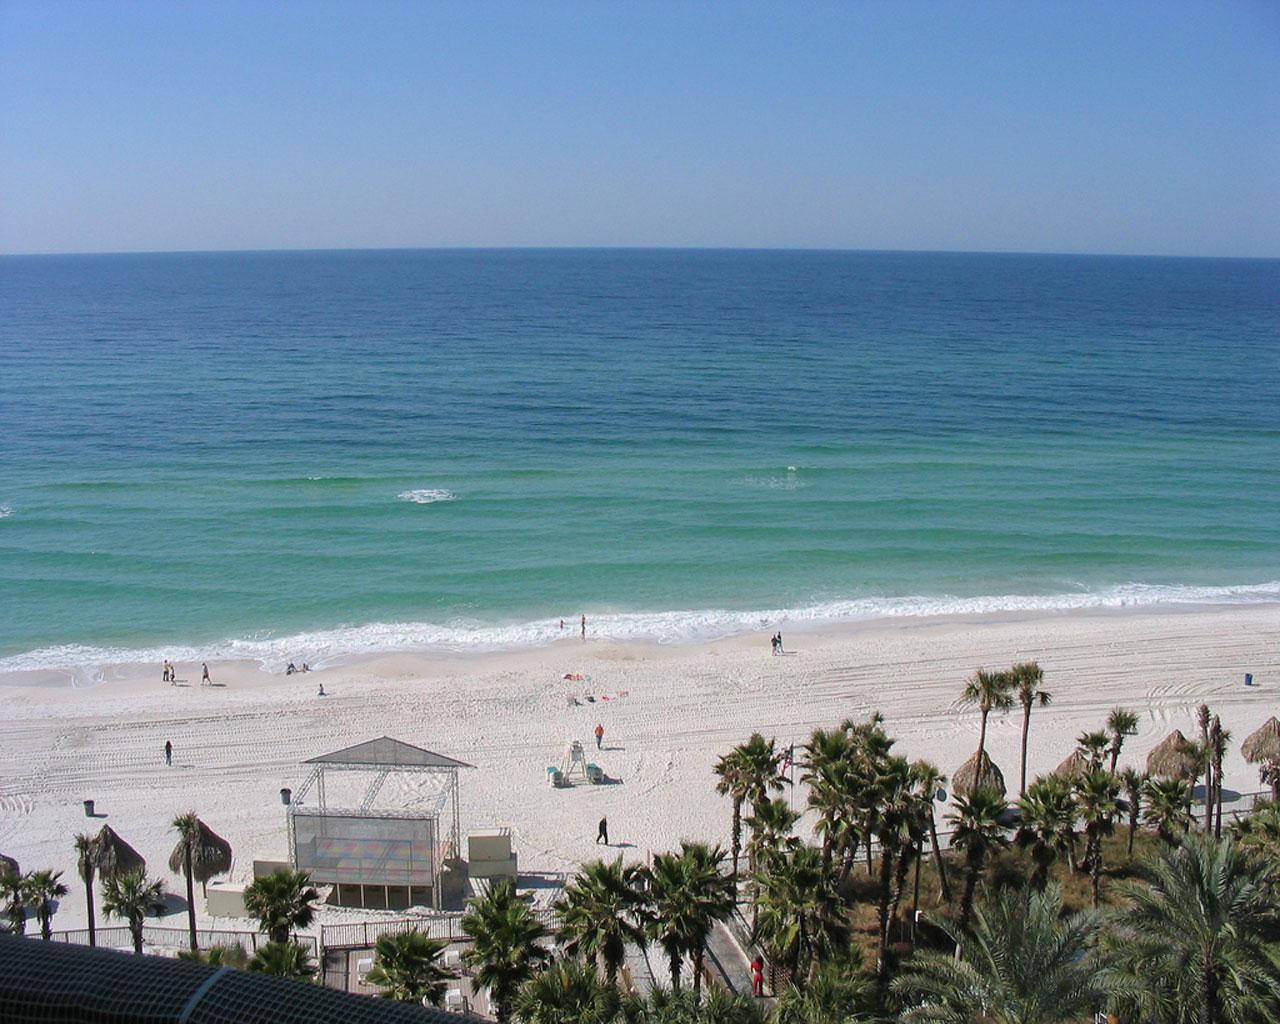 Best beach panama city beach florida 1280x1024 wallpaper 2 for Top florida beach towns